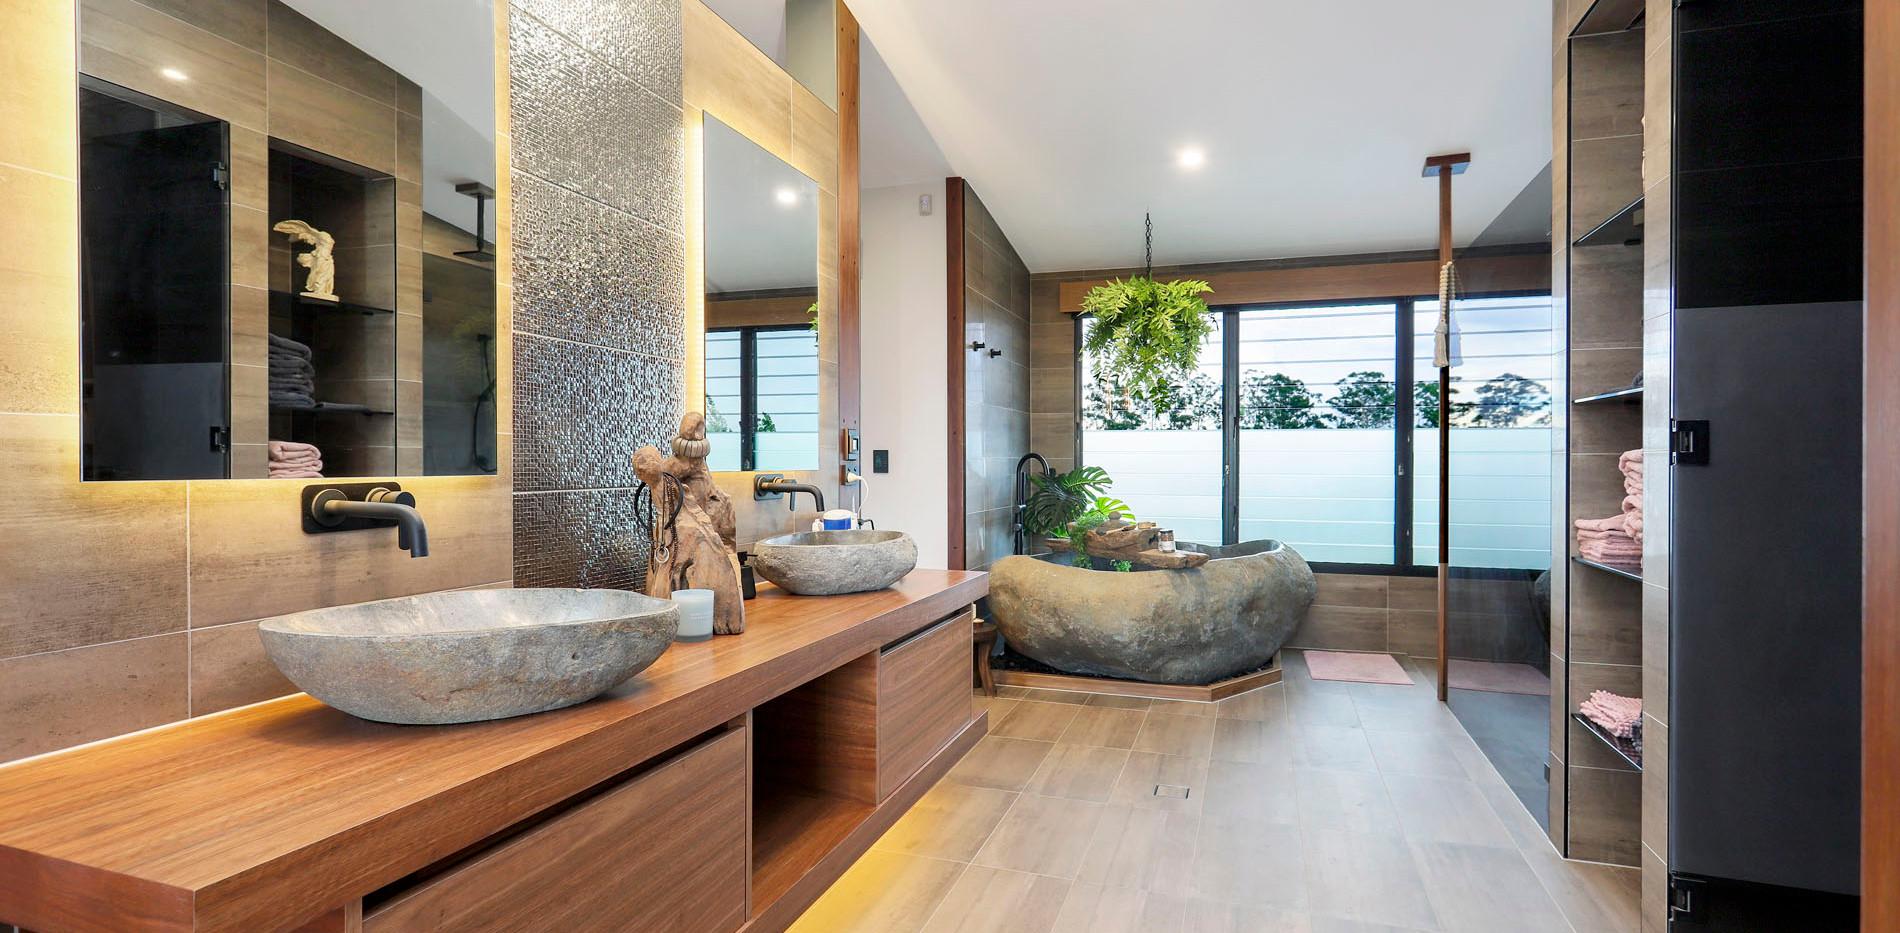 Hawkesbury bathrooms and Kitchens (62)